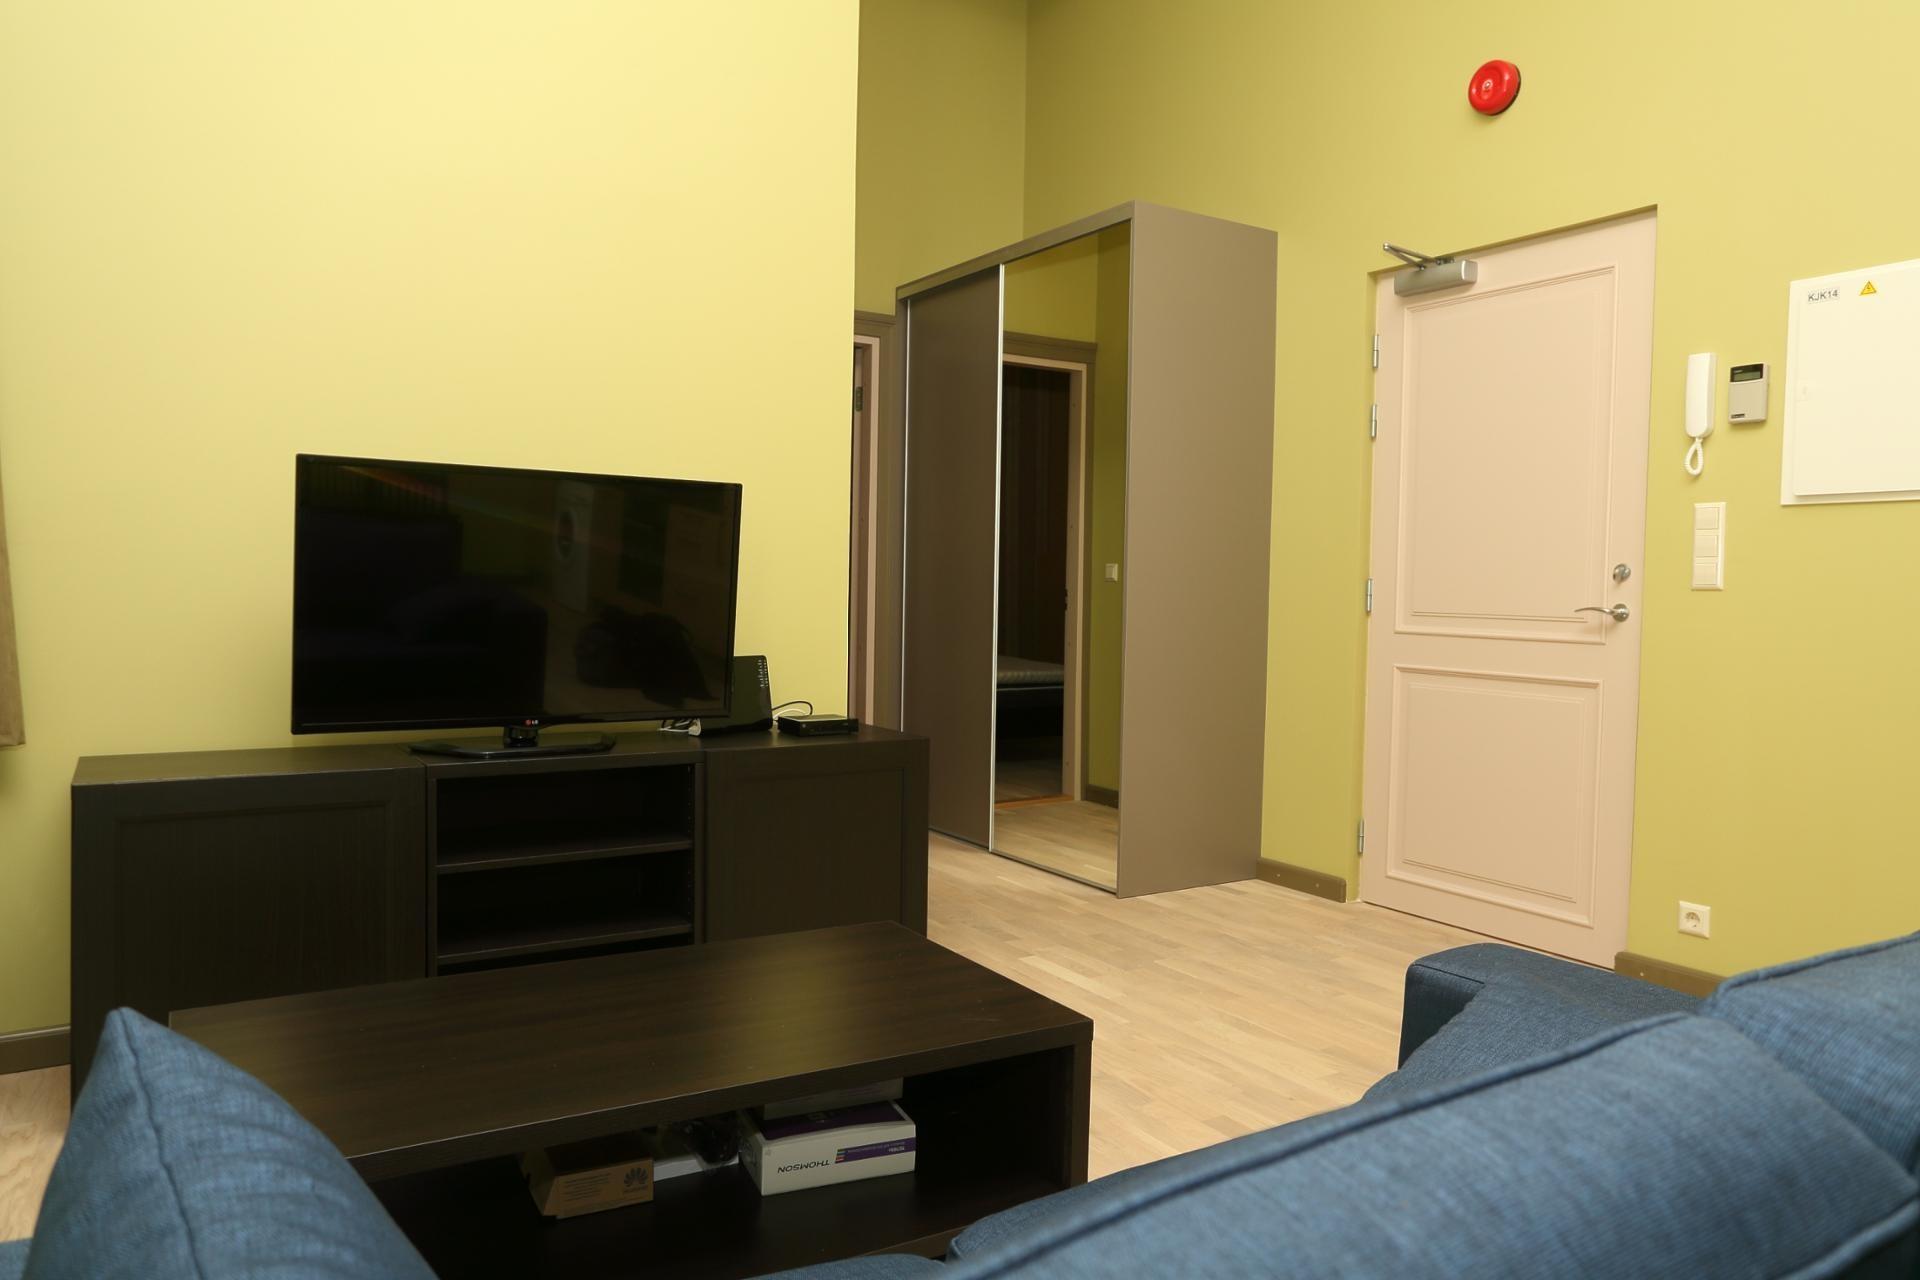 2 Room Rental Apartment. Livin. Part 69